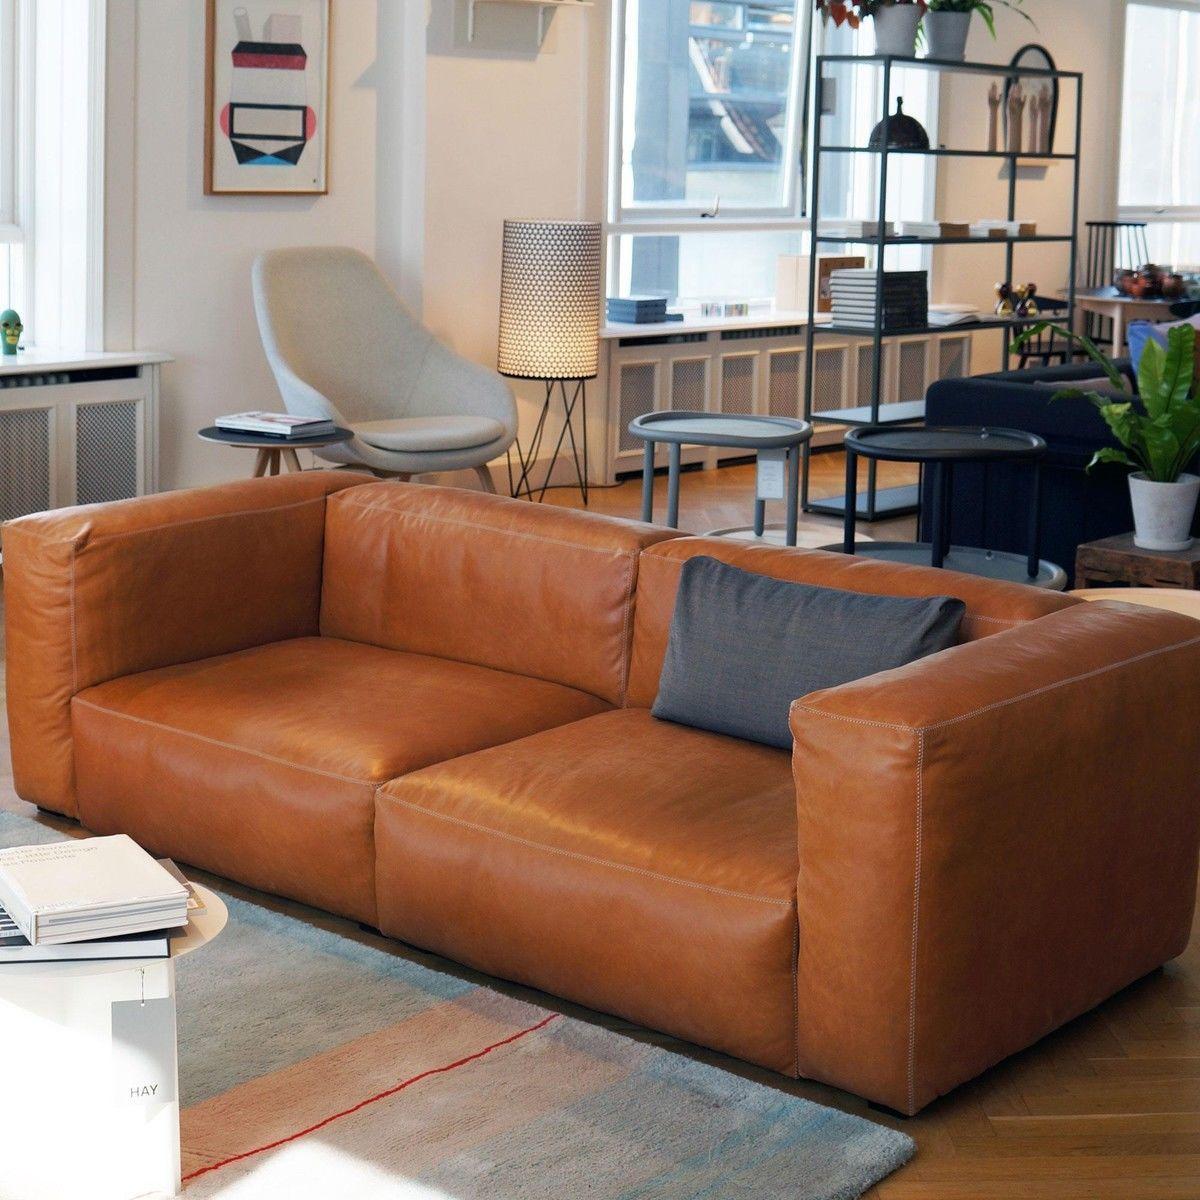 hay sofa mags leder world chairs soft 2,5-sitzer ledersofa | ambientedirect.com